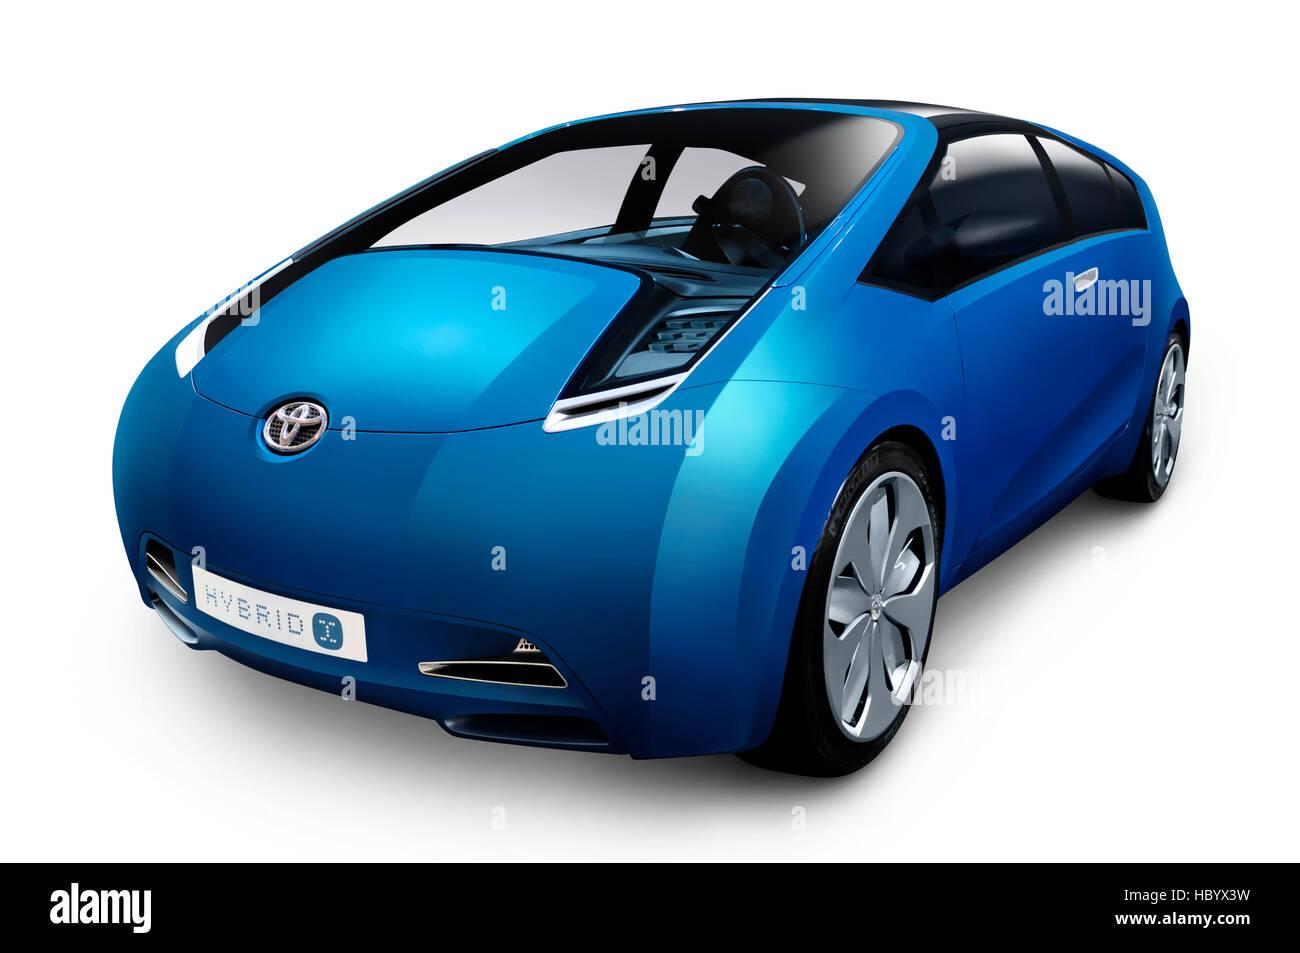 Toyota Hybrid-X concept car híbrido Imagen De Stock